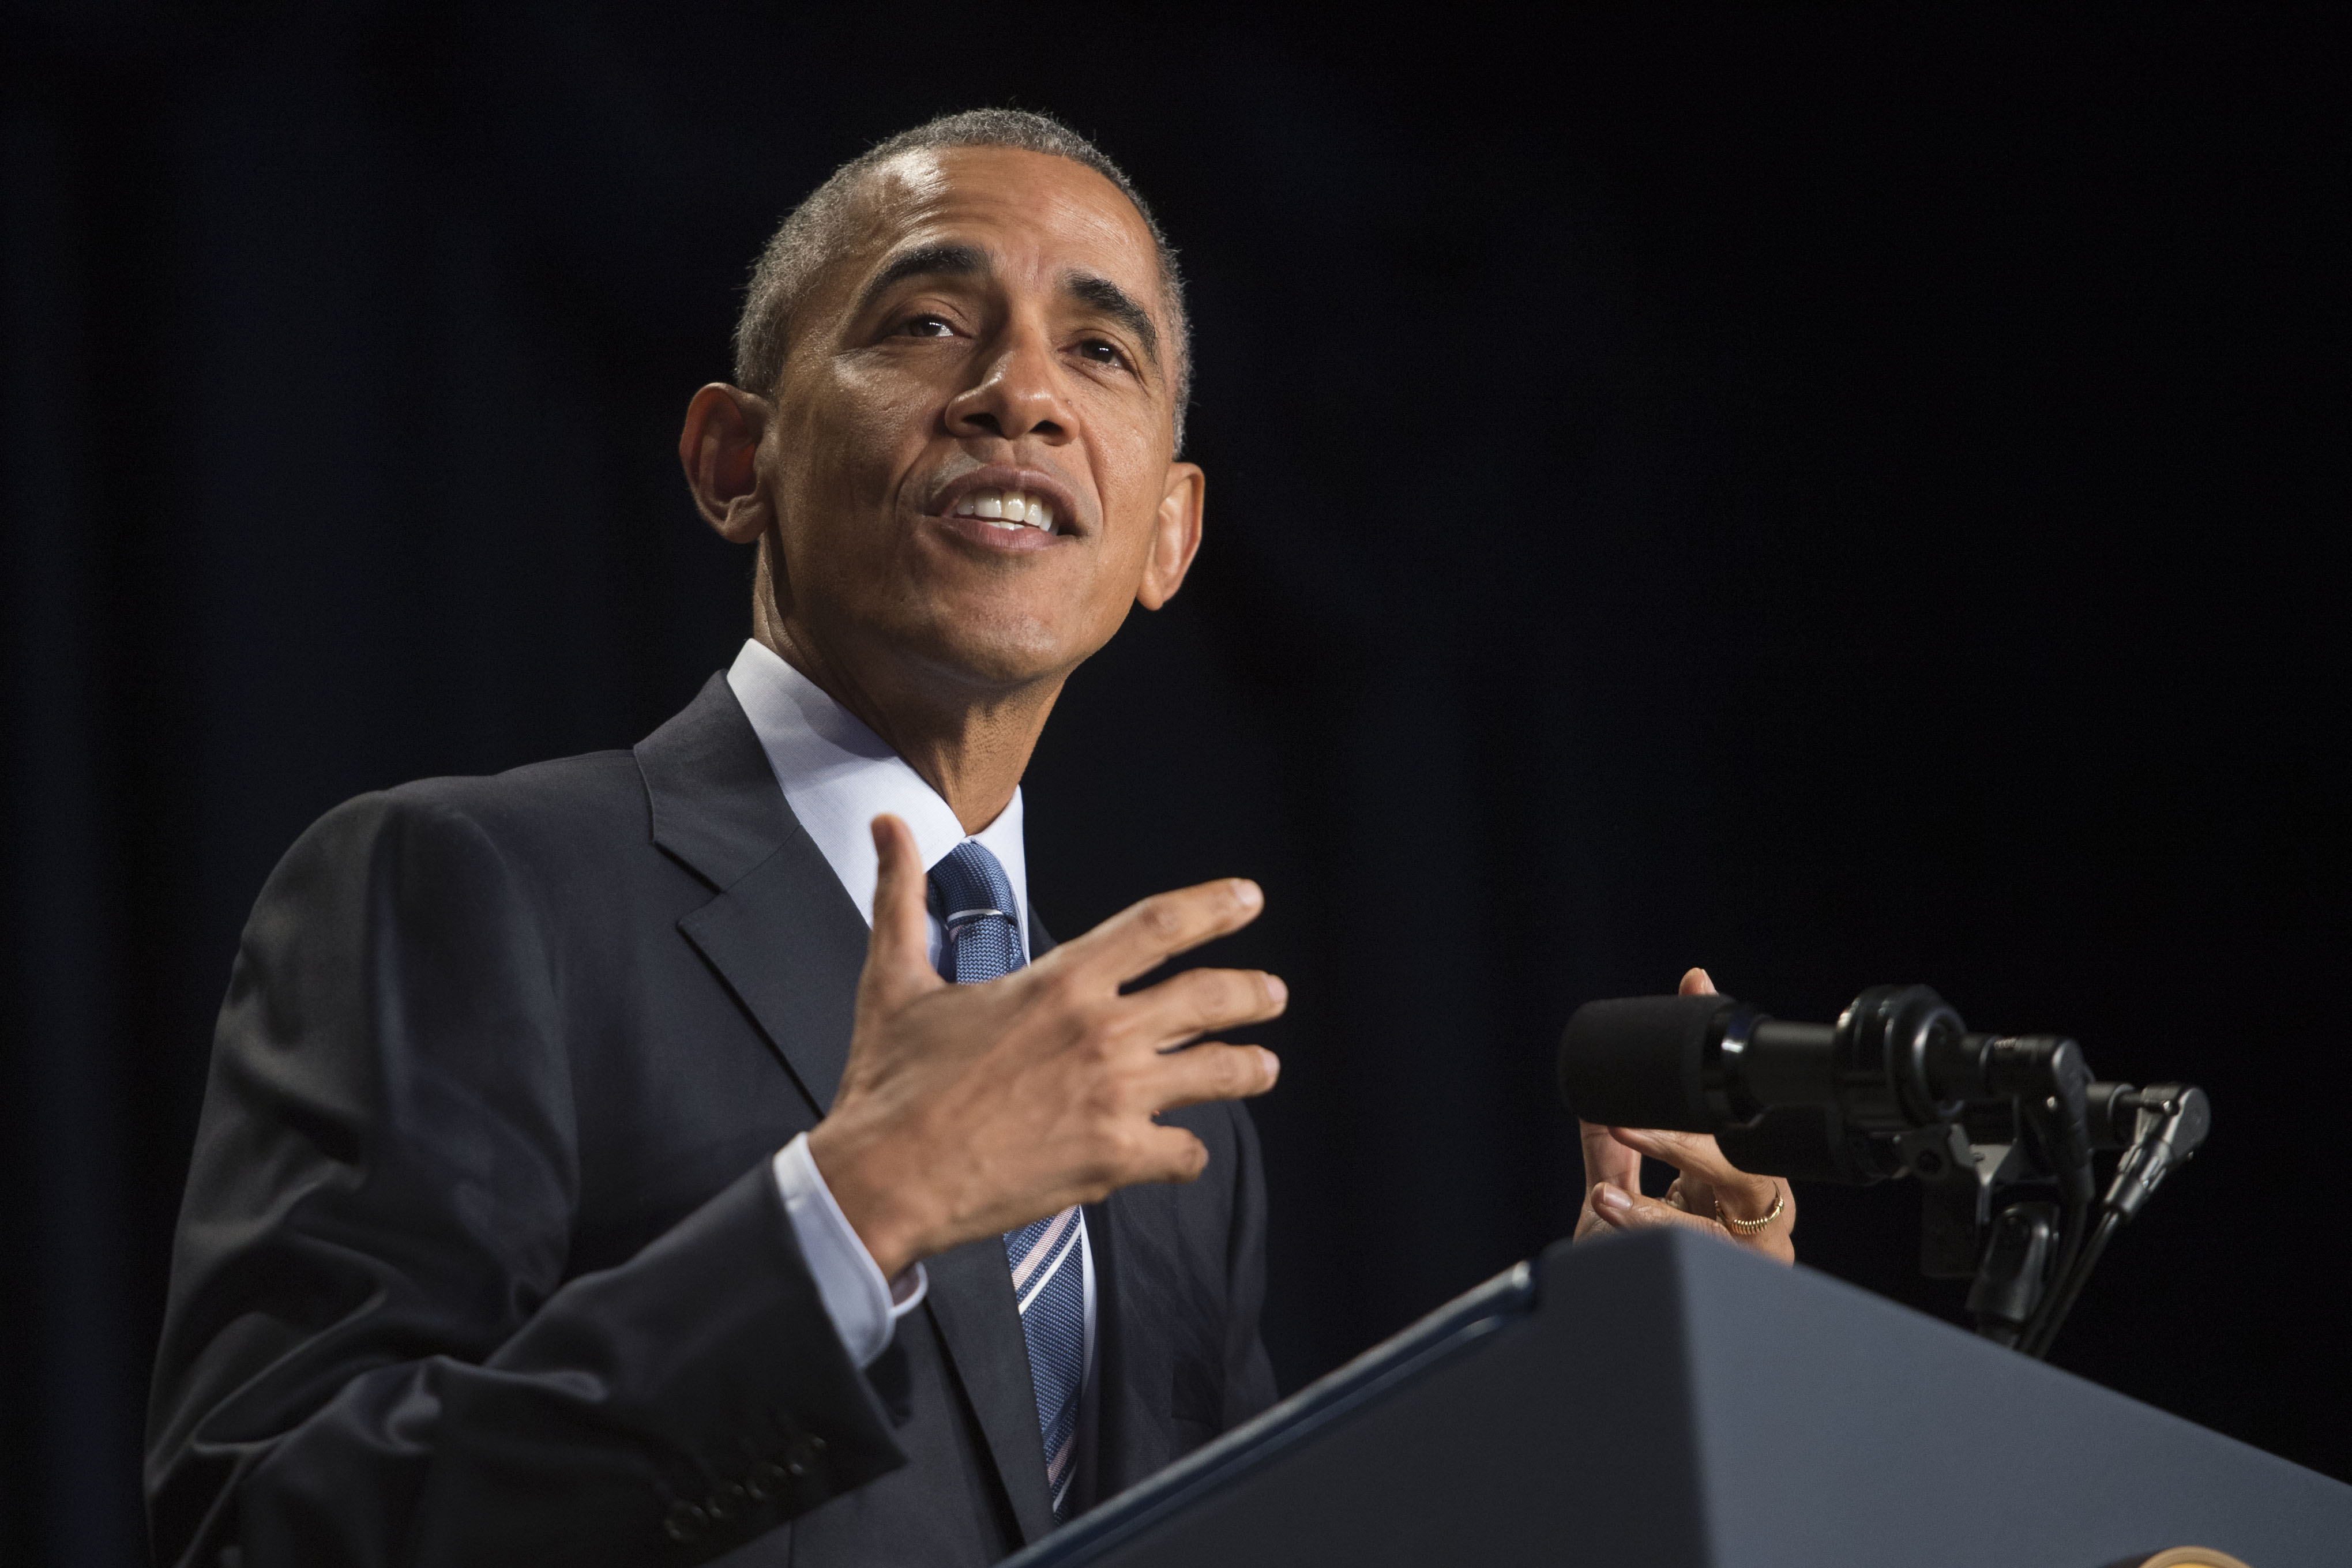 U.S. President Barack Obama delivers remarks at the National Prayer Breakfast on Feb. 4, 2016 in Washington, DC